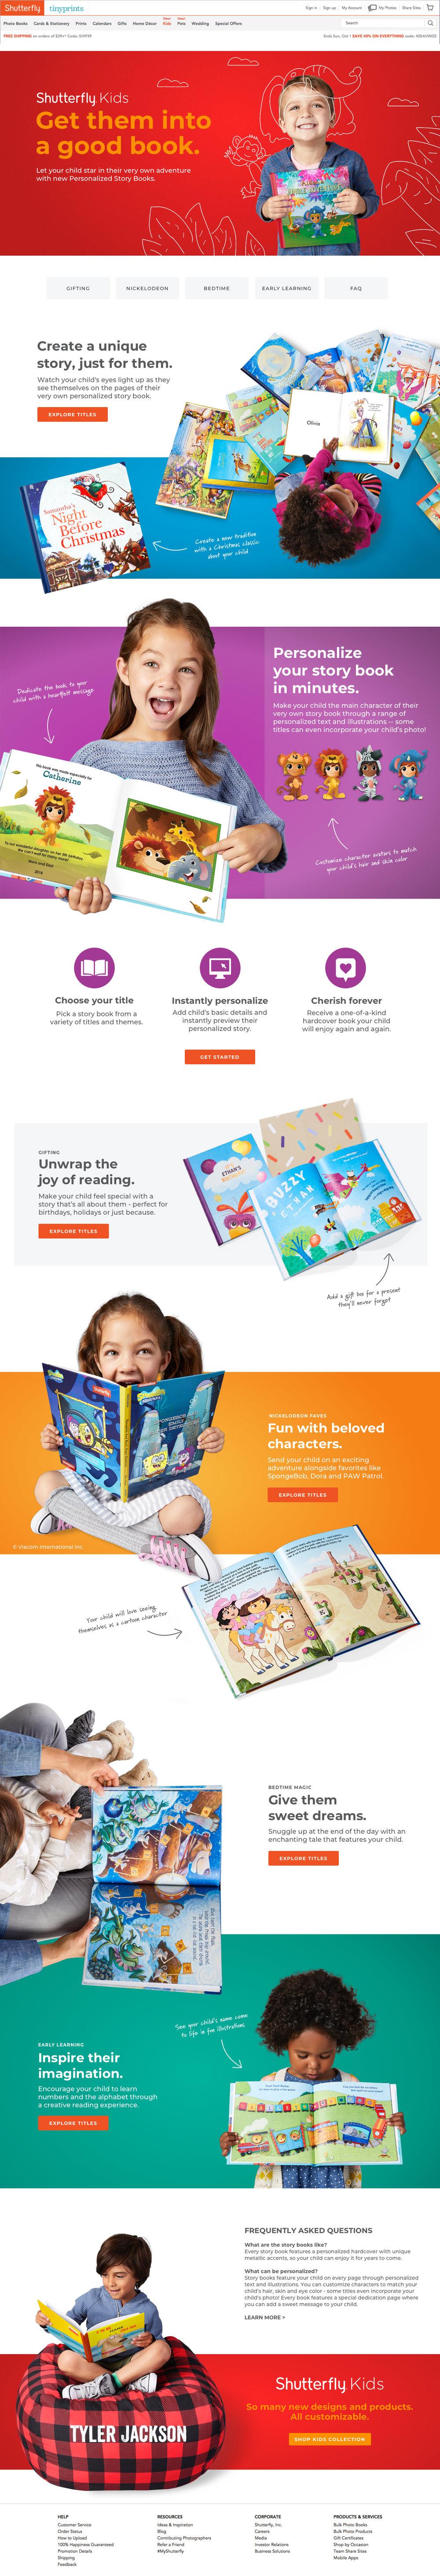 storybooks_R5_desktop.jpg